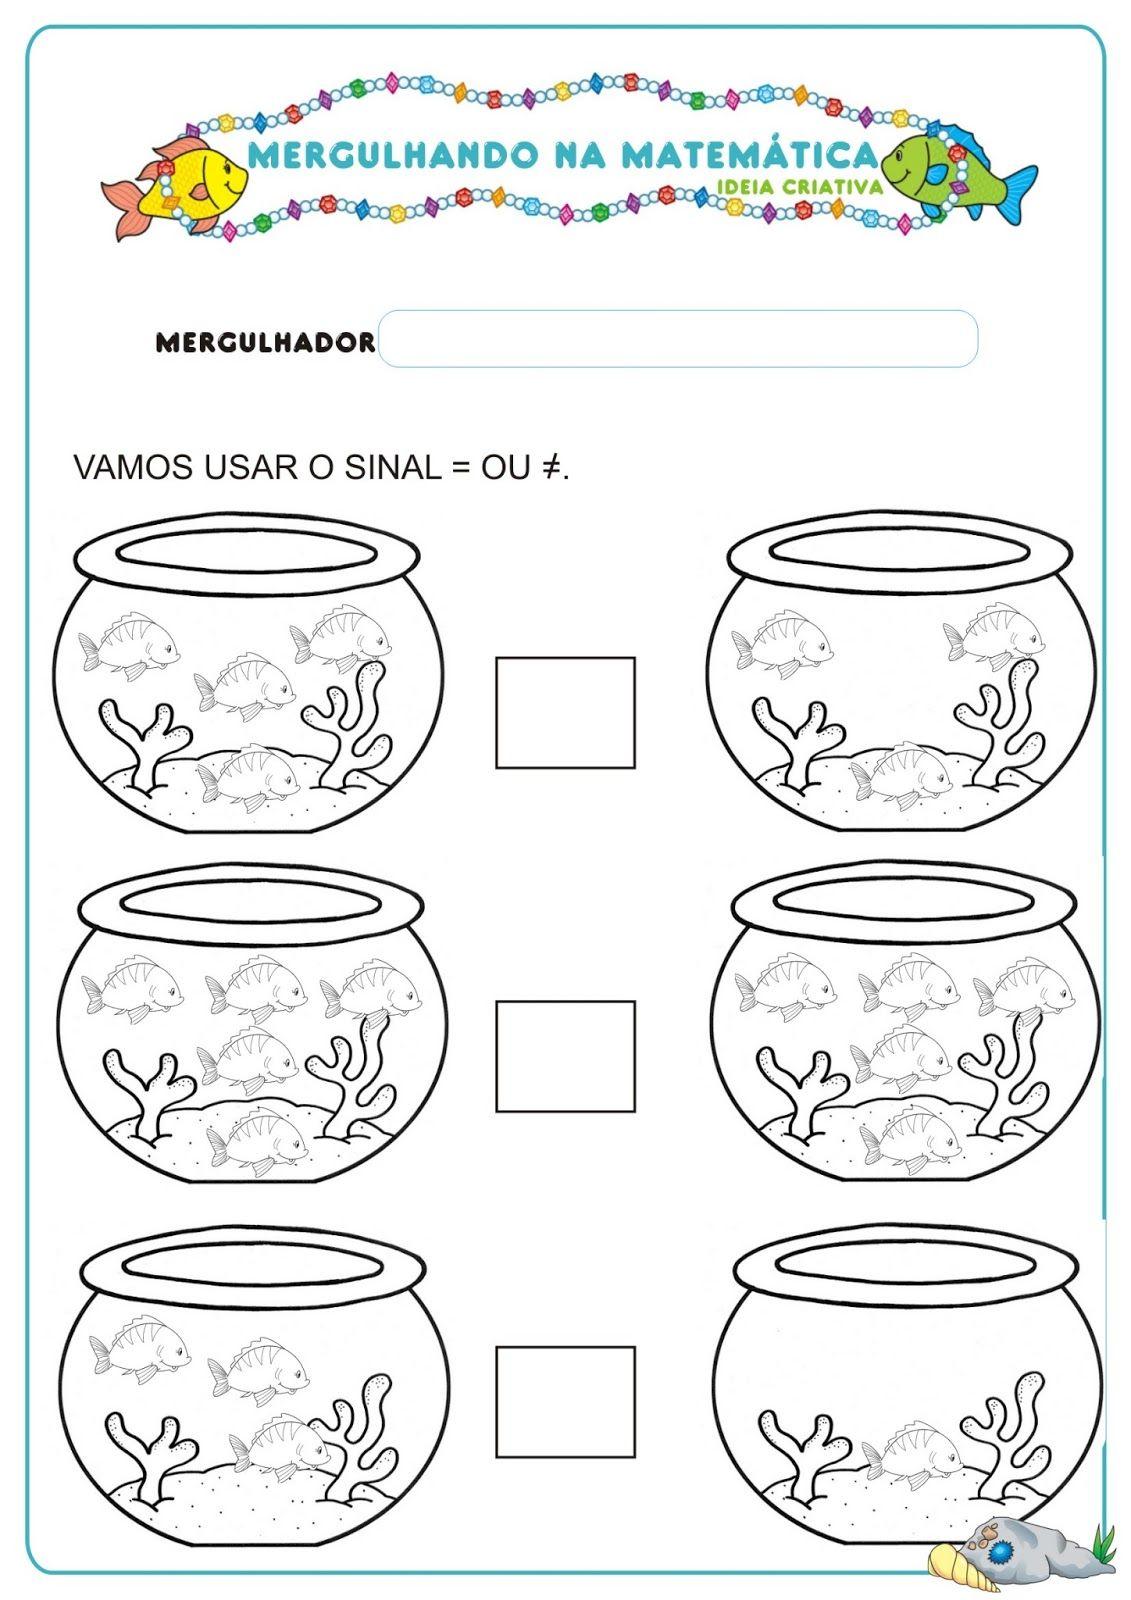 Tel de vissen, free printable | Educação Infantil | Pinterest | Free ...